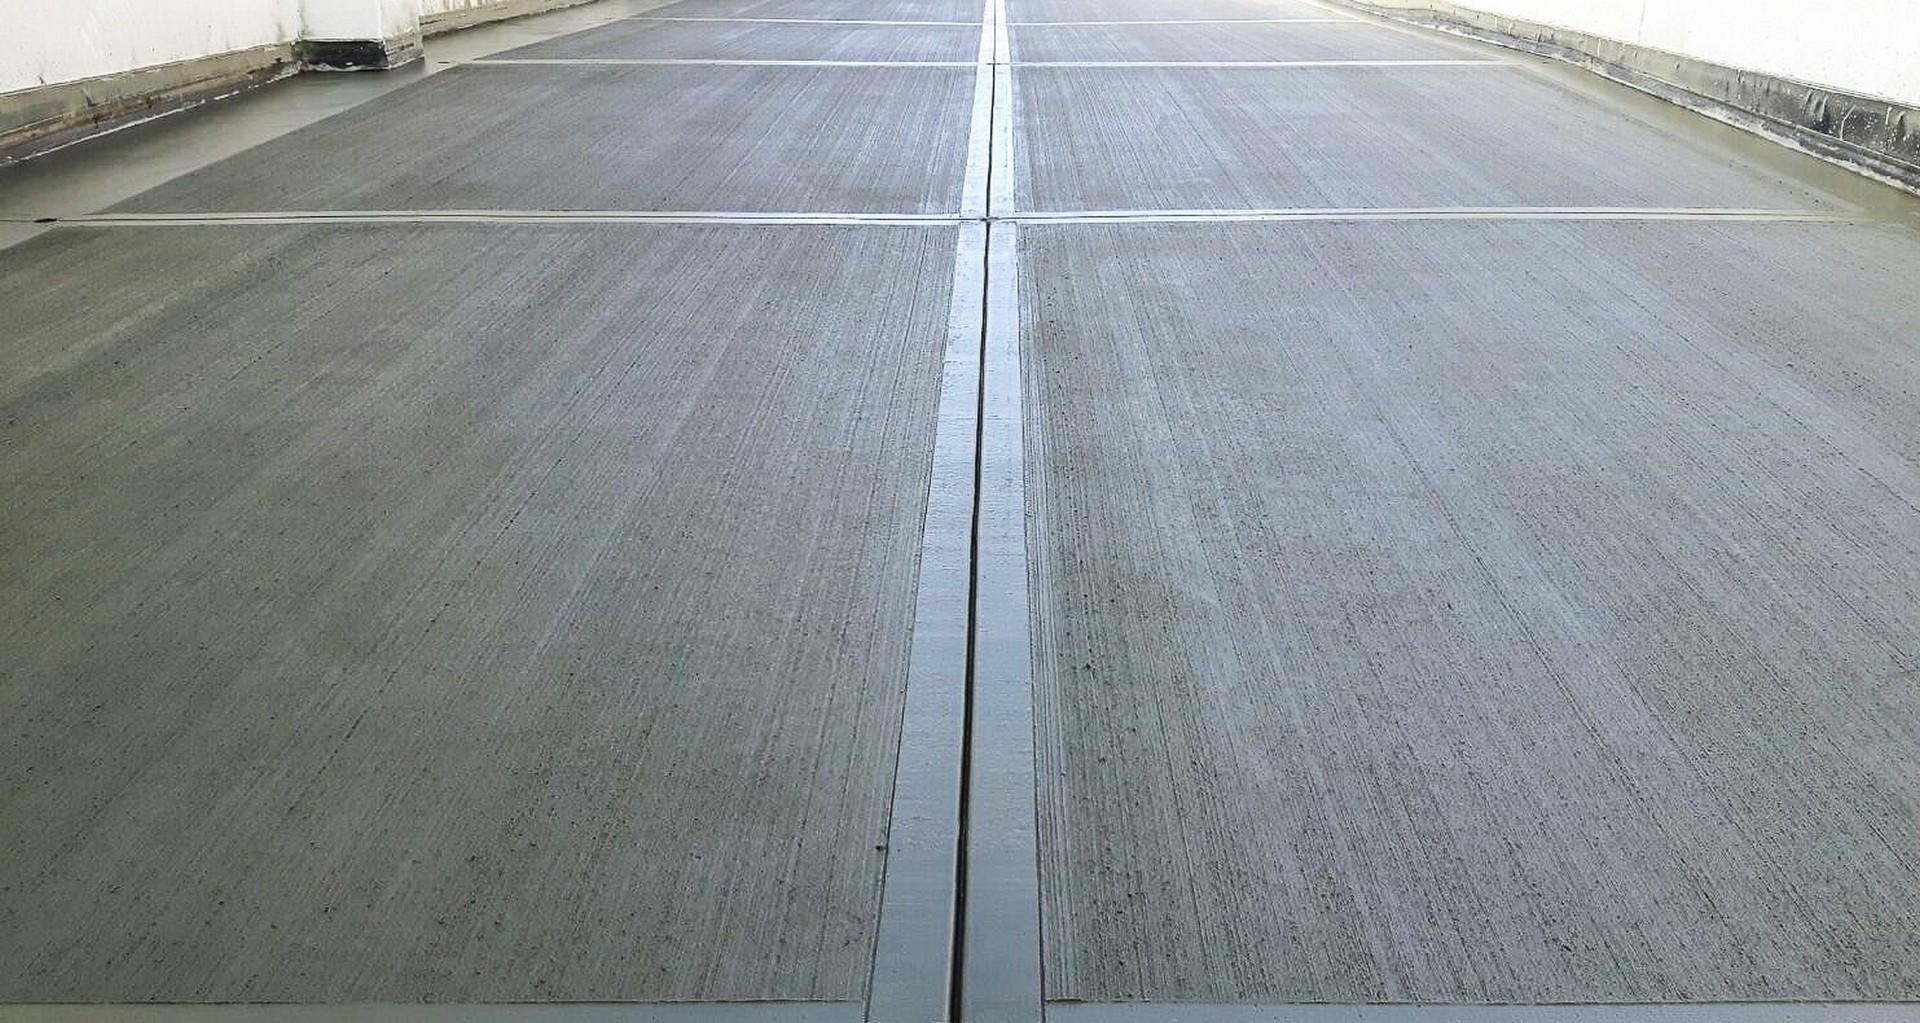 Pavimentazioni e costruzioni stradali - Tomatis Giacomo Srl